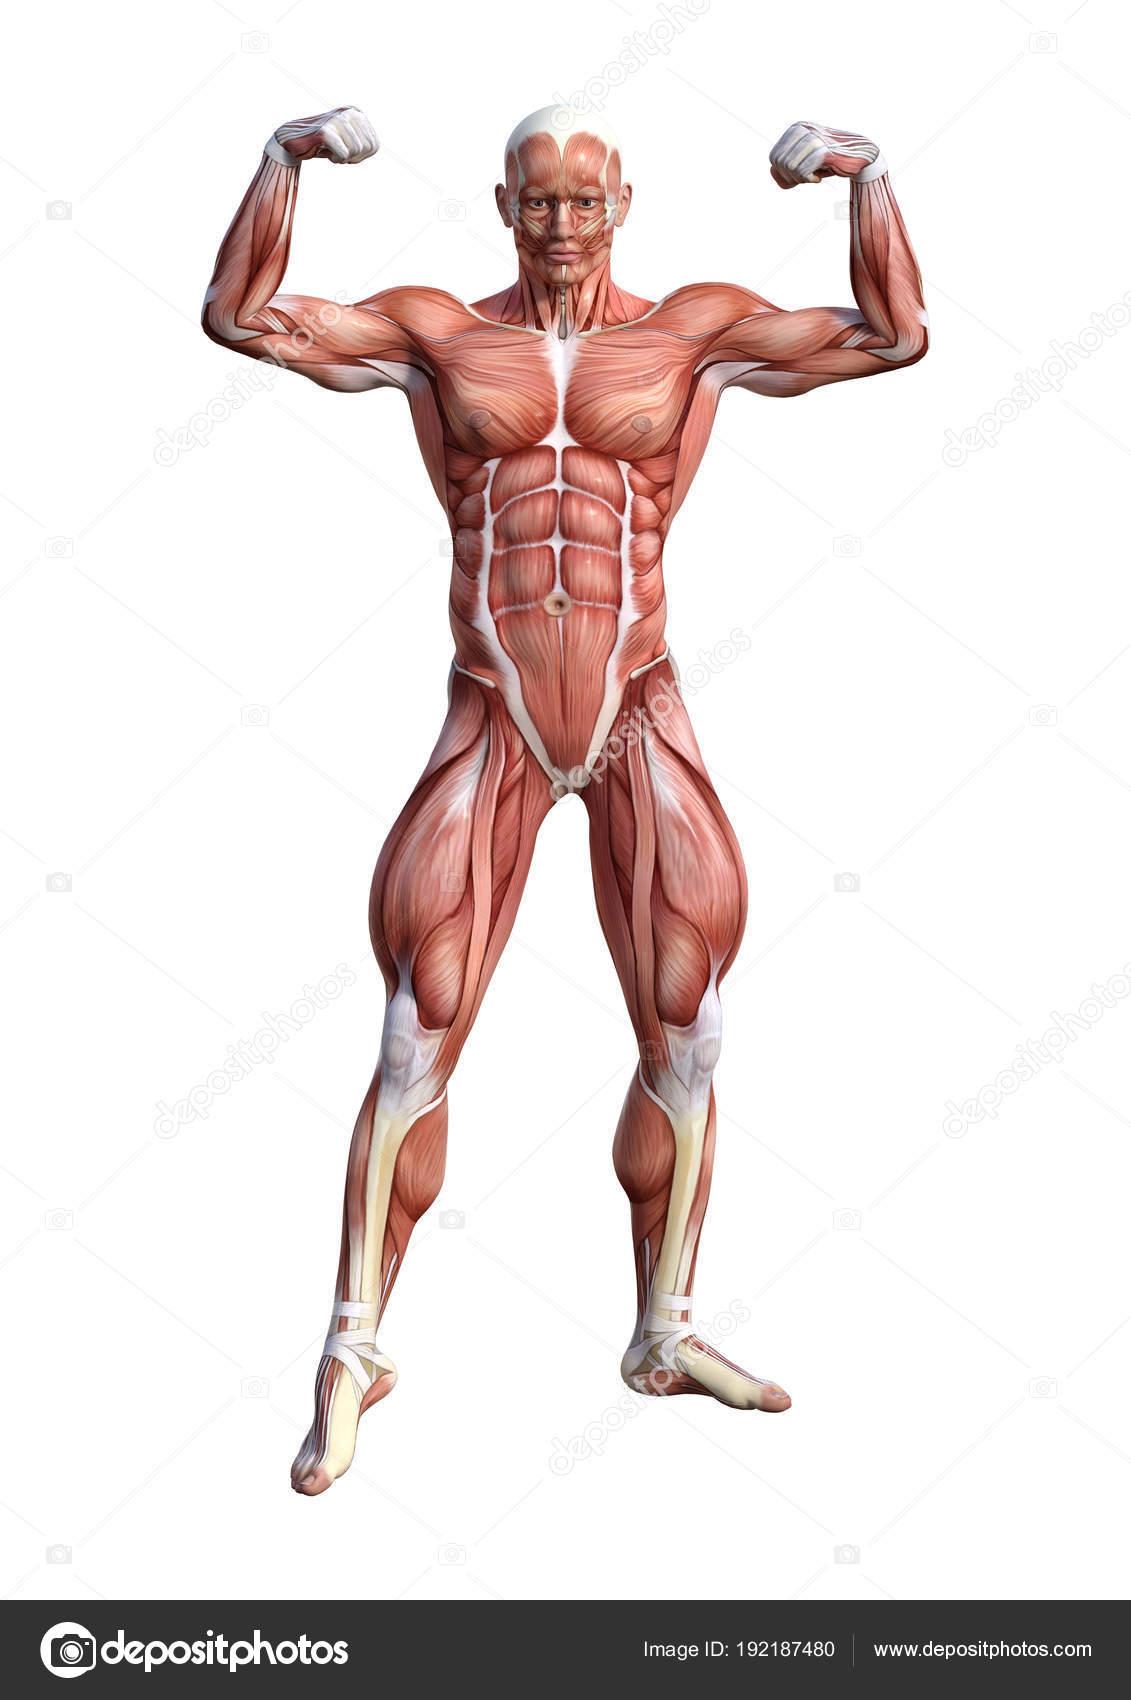 Magnificent Male Anatomy Figure Illustration - Anatomy Ideas ...